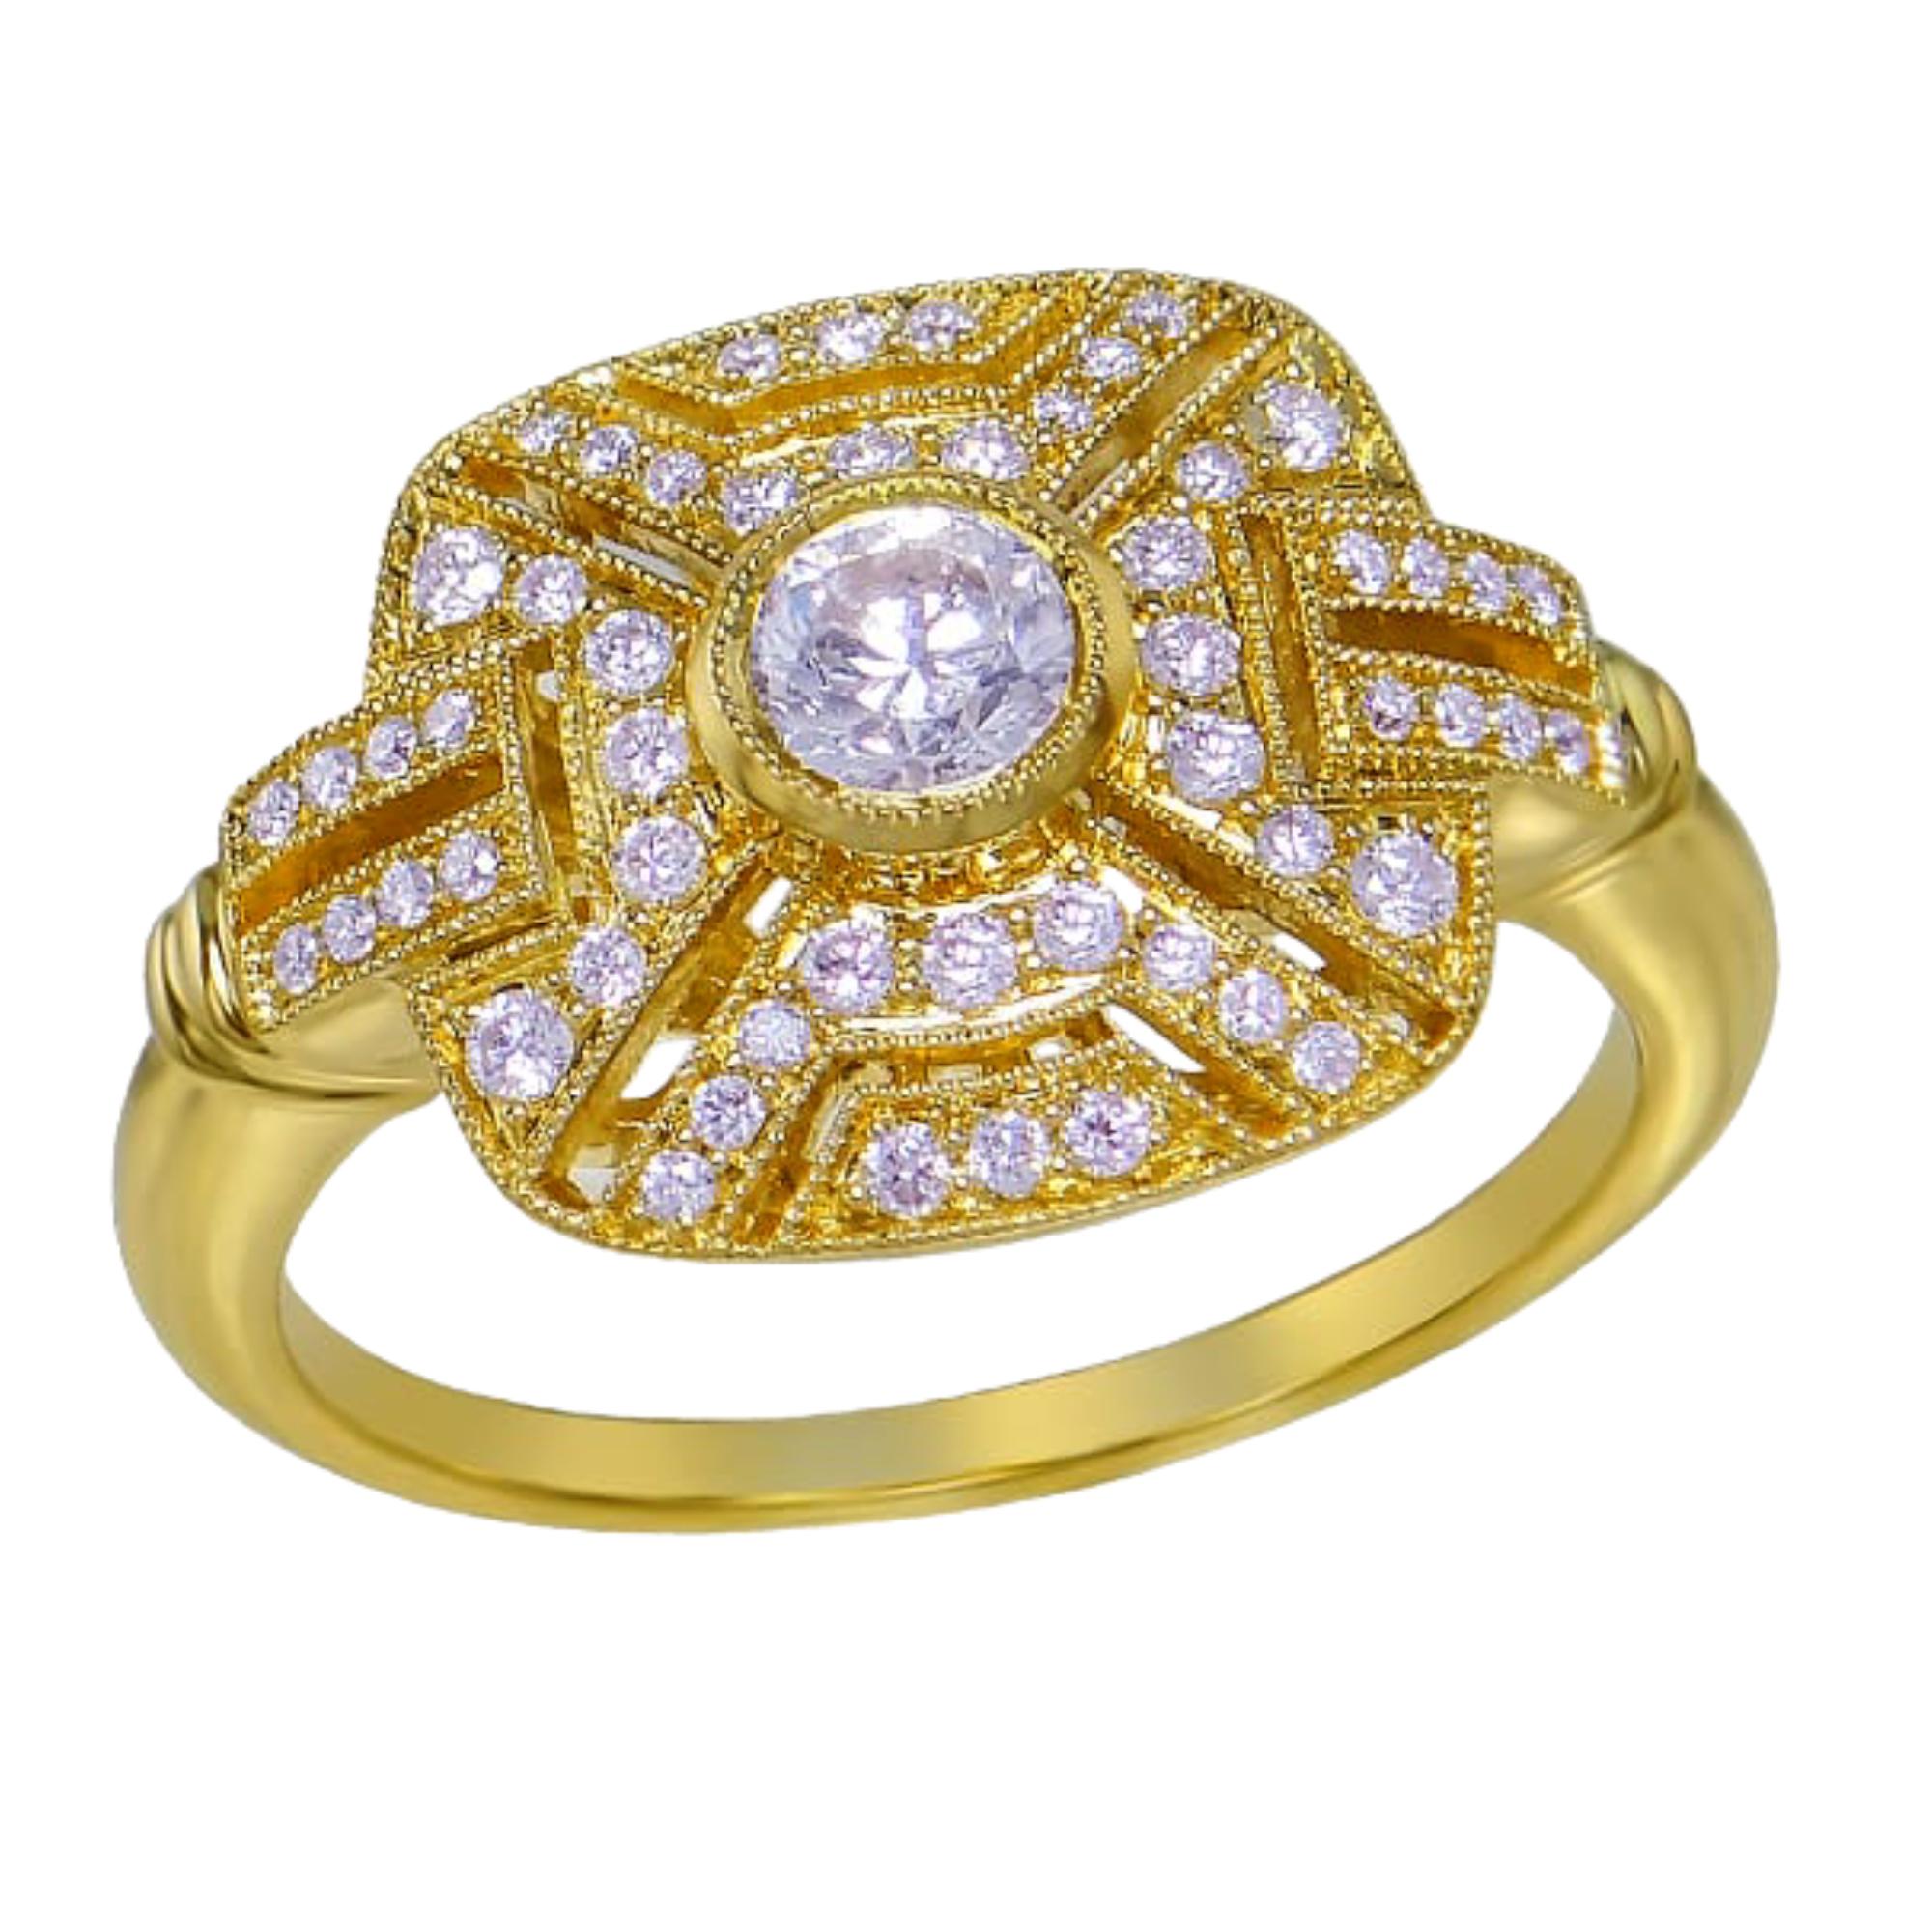 18ct Yellow Gold Art Deco Diamond Ring